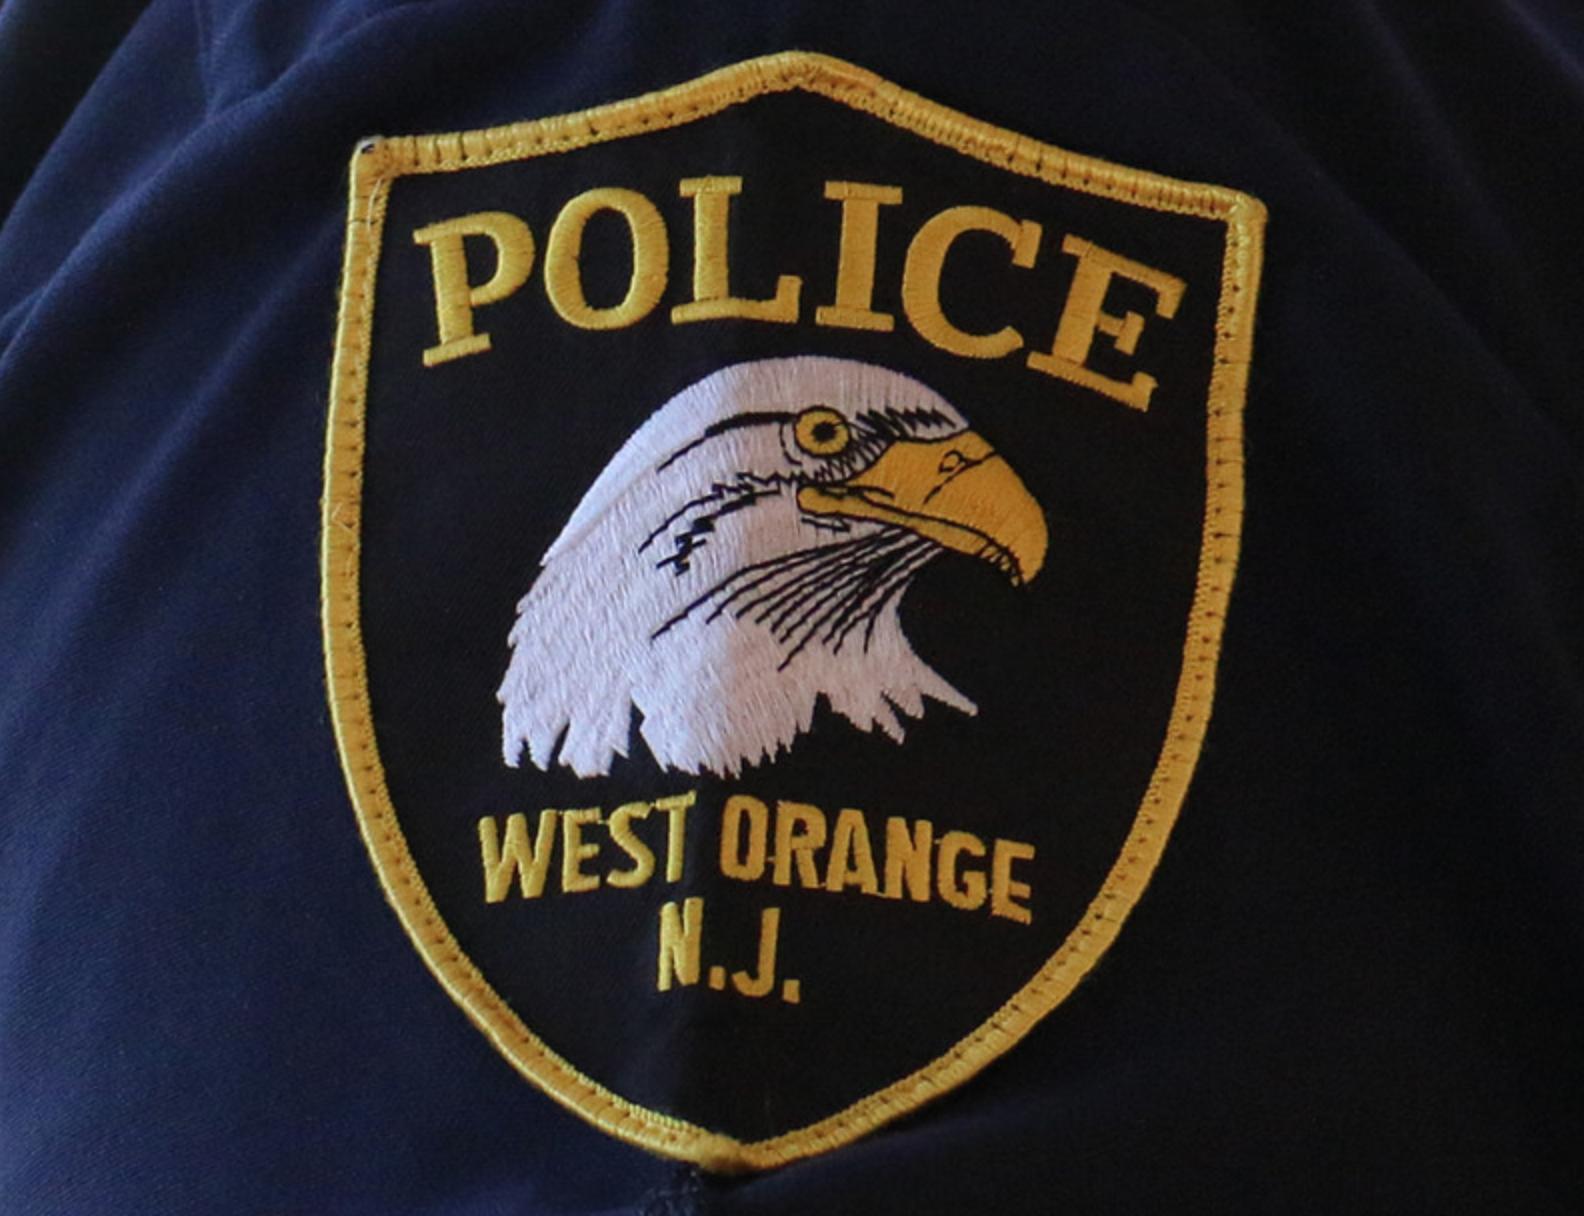 8b4aa436607e1b3d24ea_West_Orange_Police.jpg